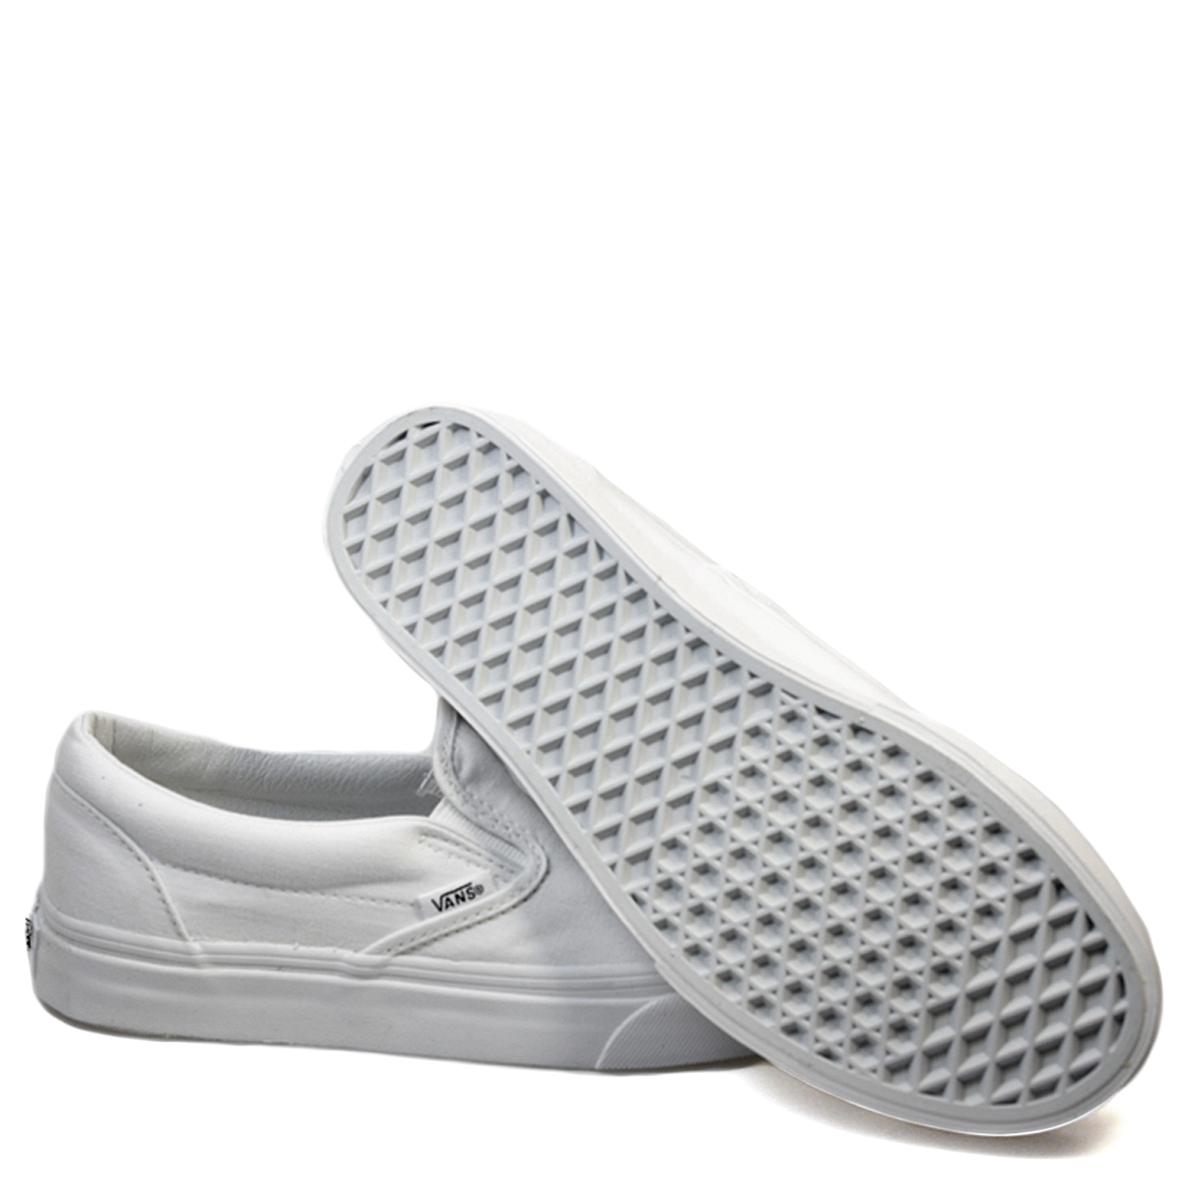 Vans-Clasico-Unisex-para-hombre-para-mujer-Slip-